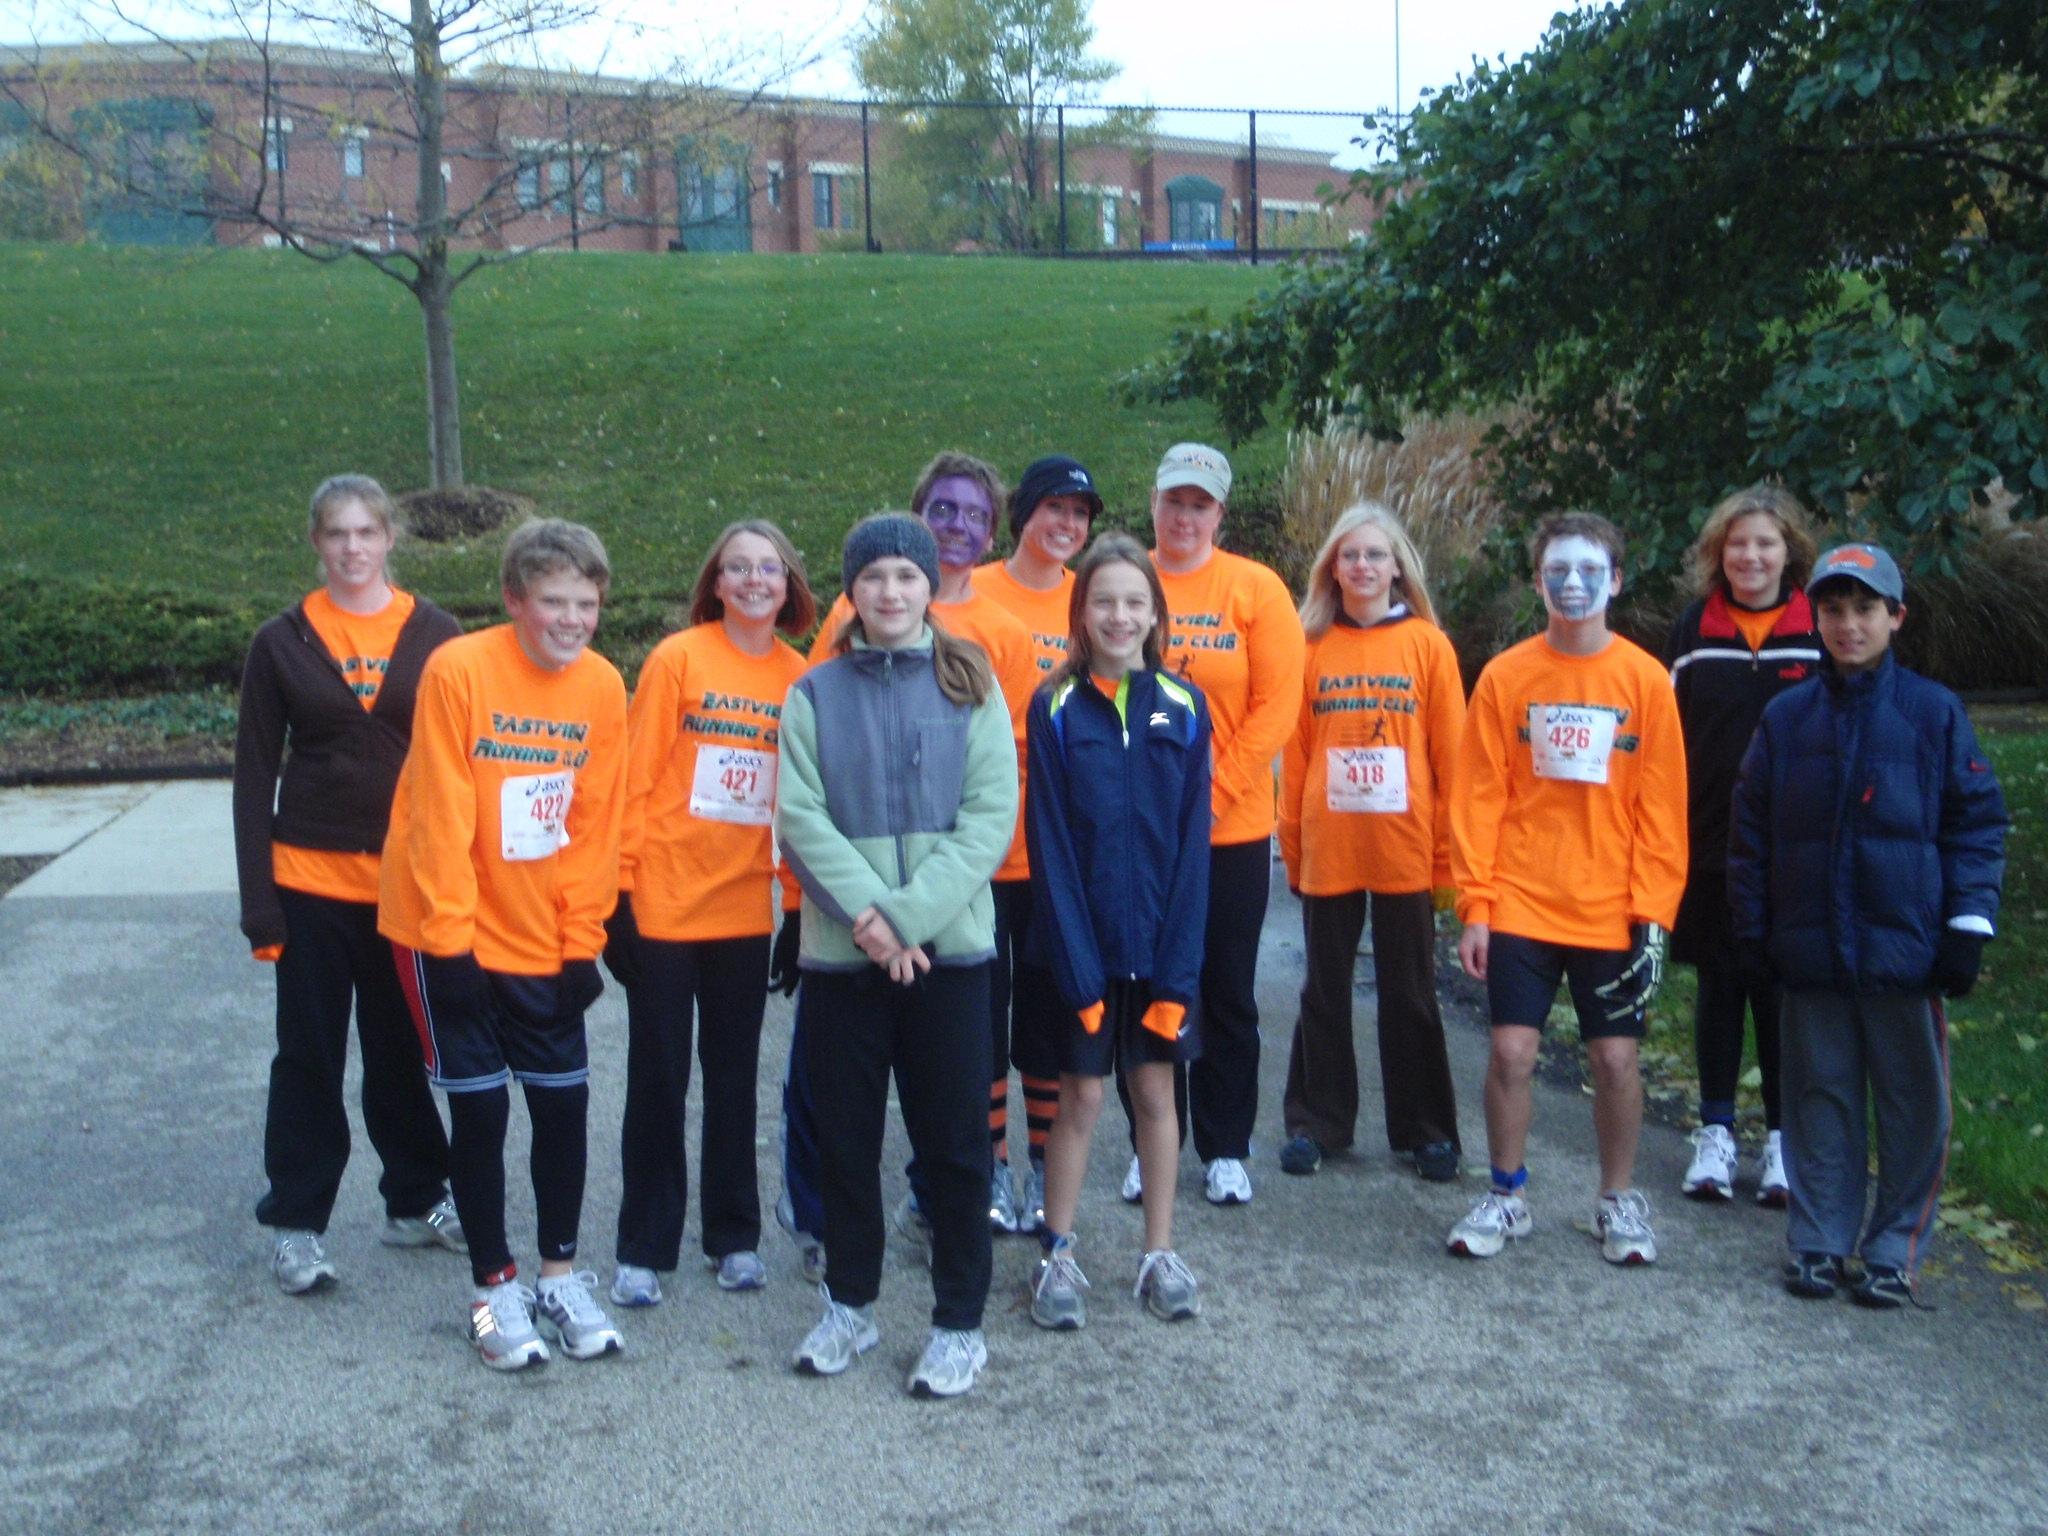 eastview running club 2009